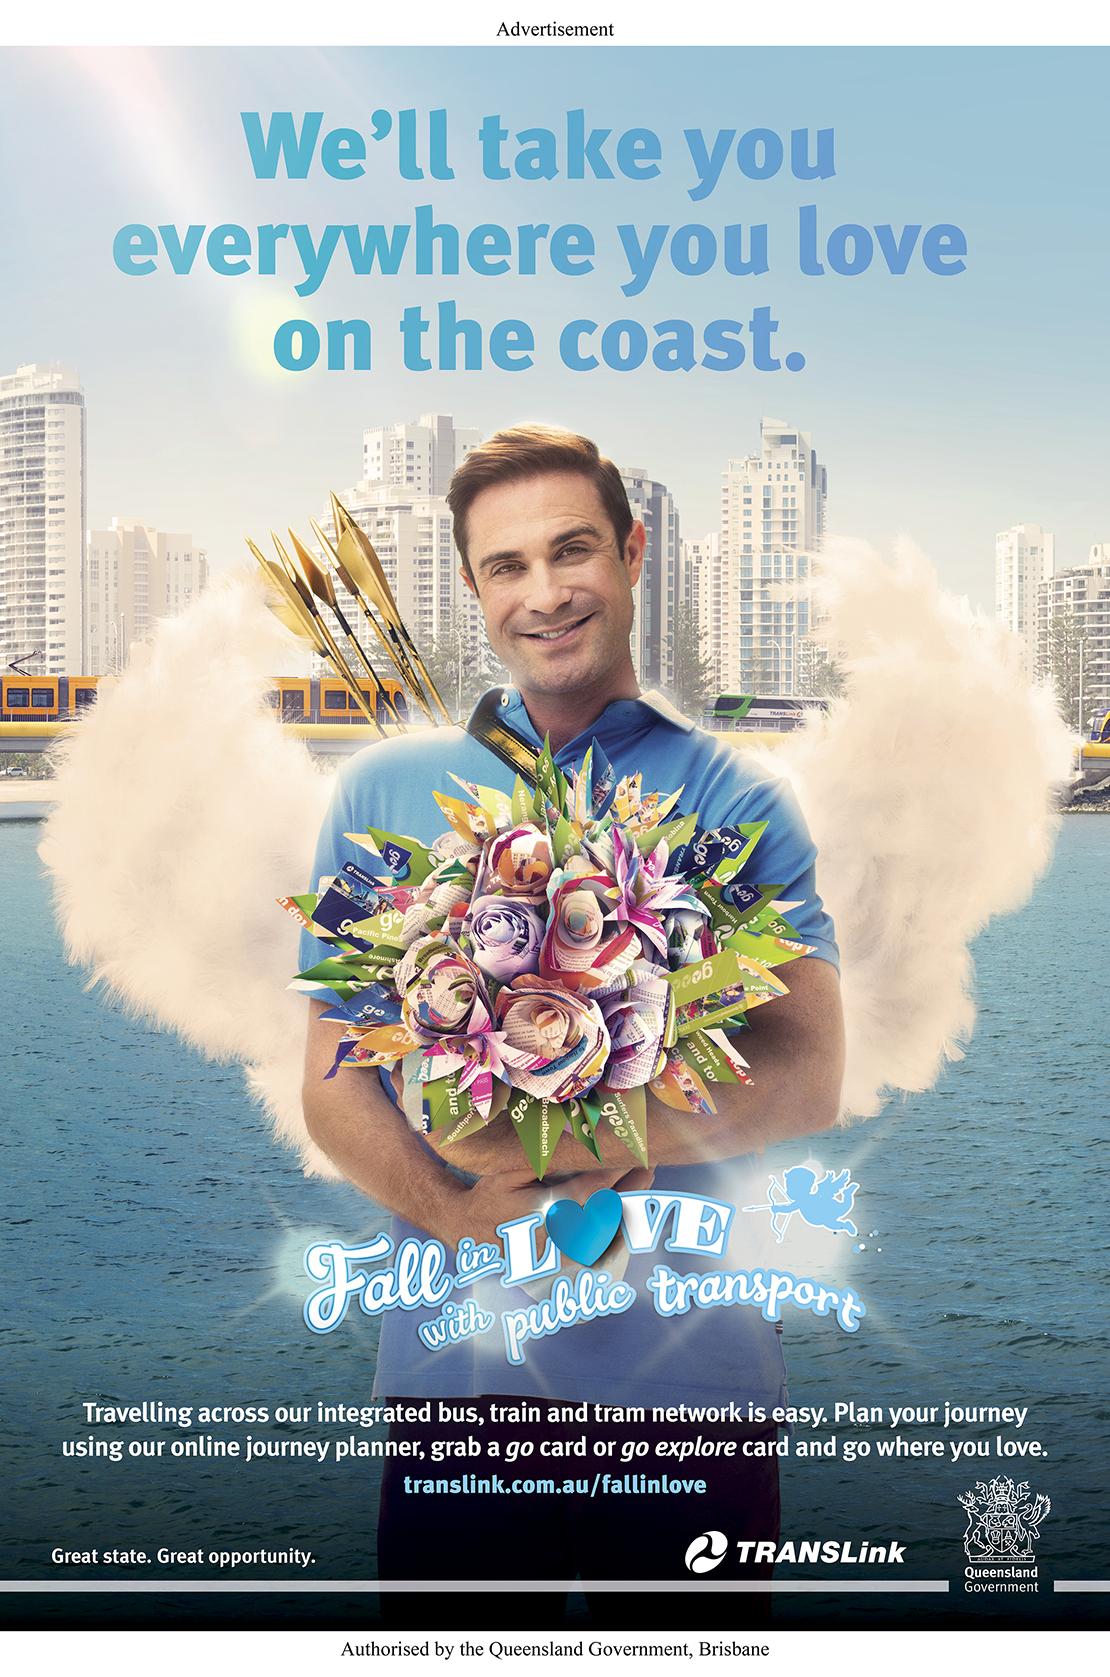 Gold Coast campaign